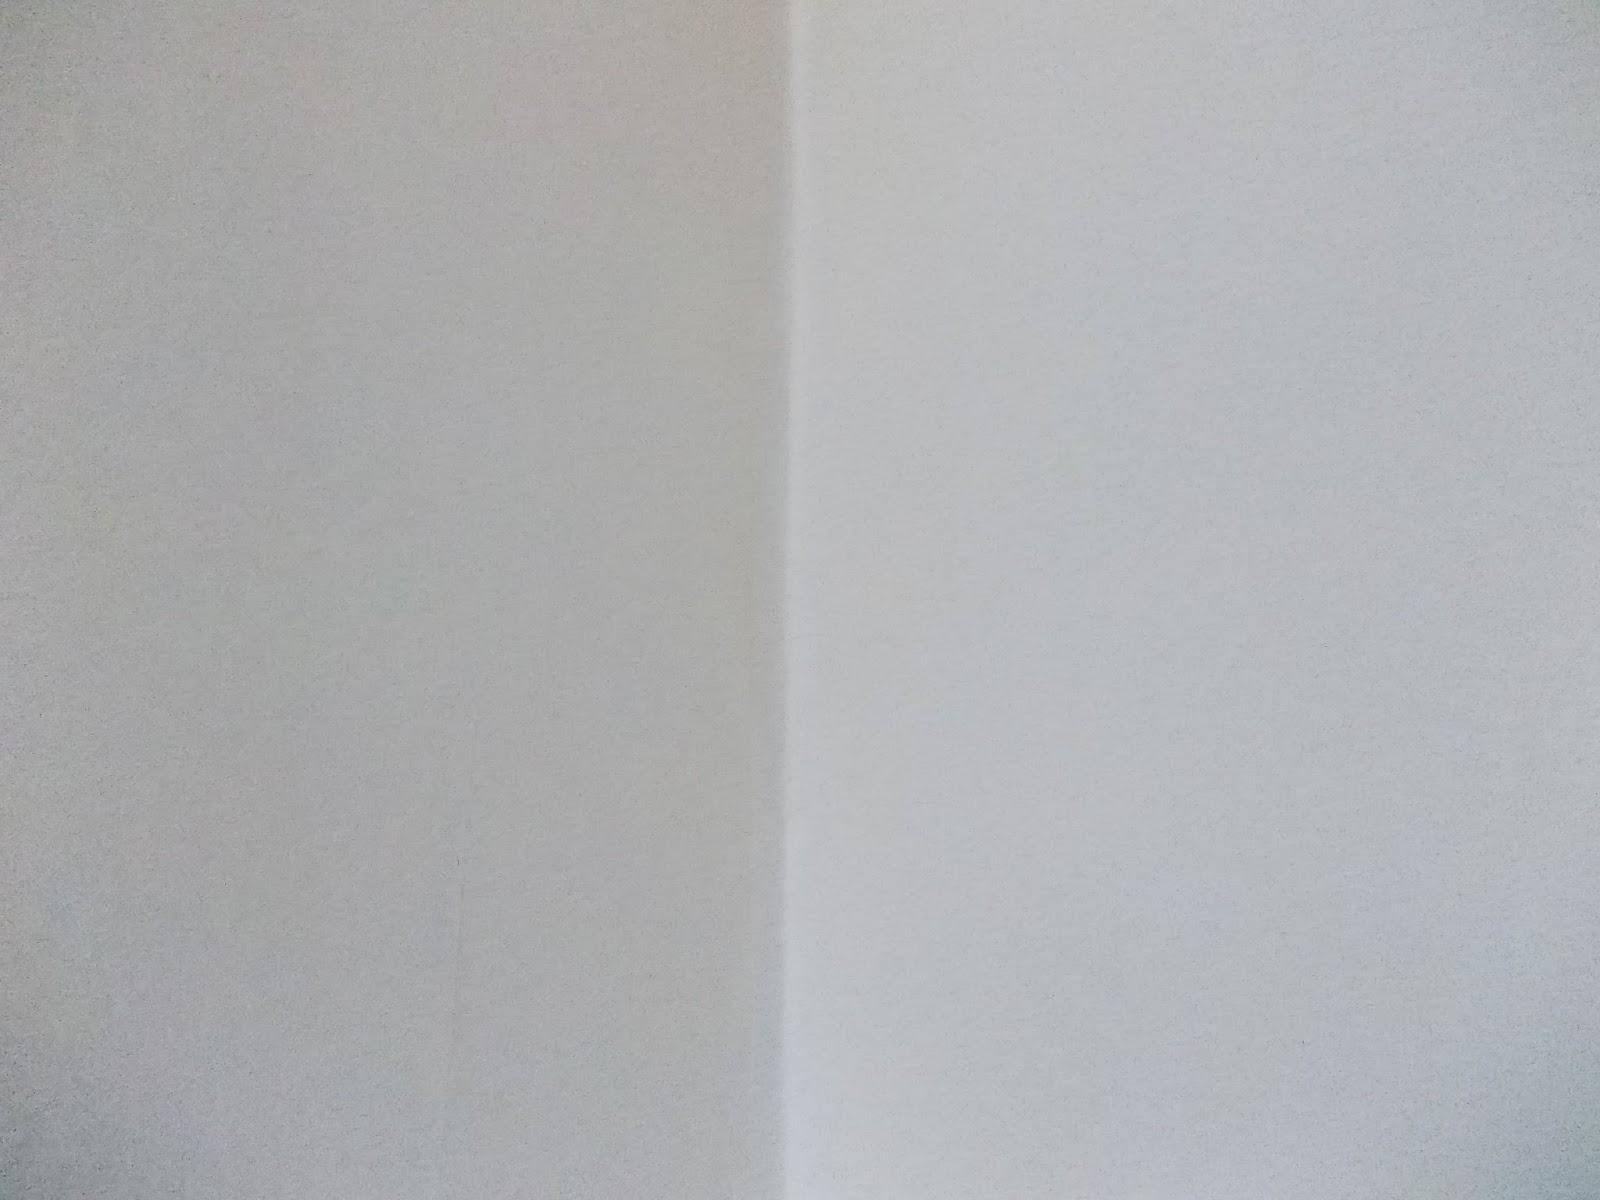 marcella testet auro plantodecor premium wandfarbe im test. Black Bedroom Furniture Sets. Home Design Ideas